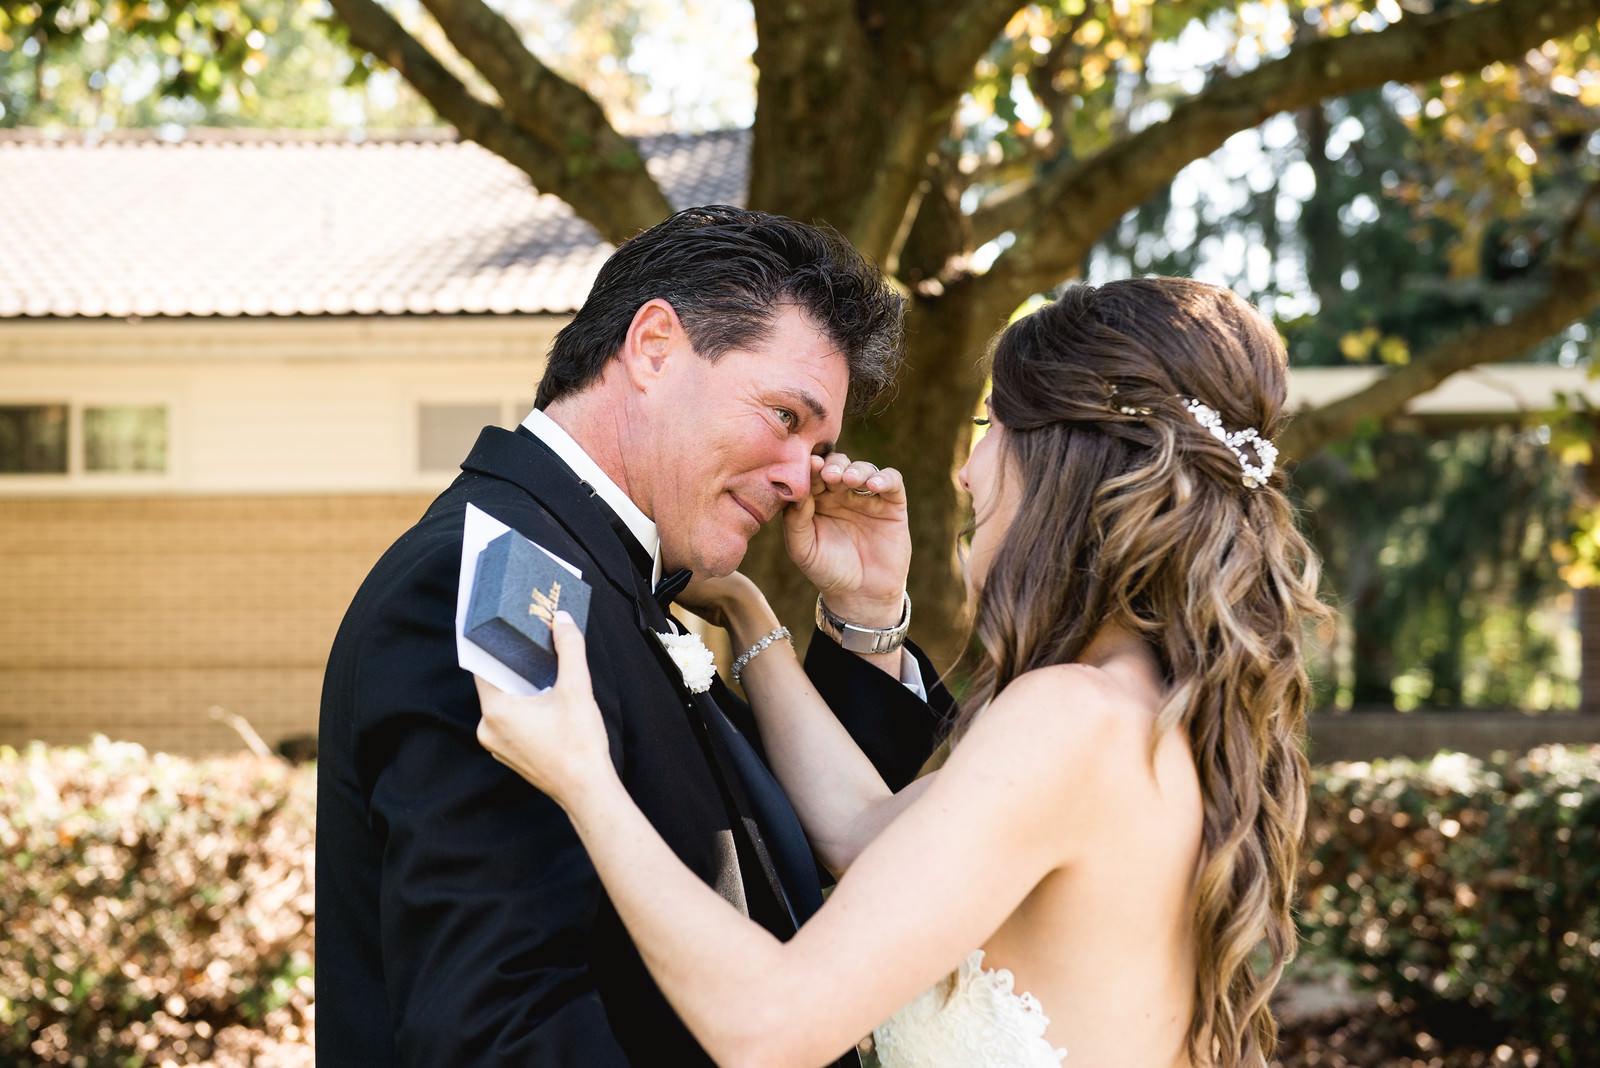 first_look_on_wedding_day4.jpg